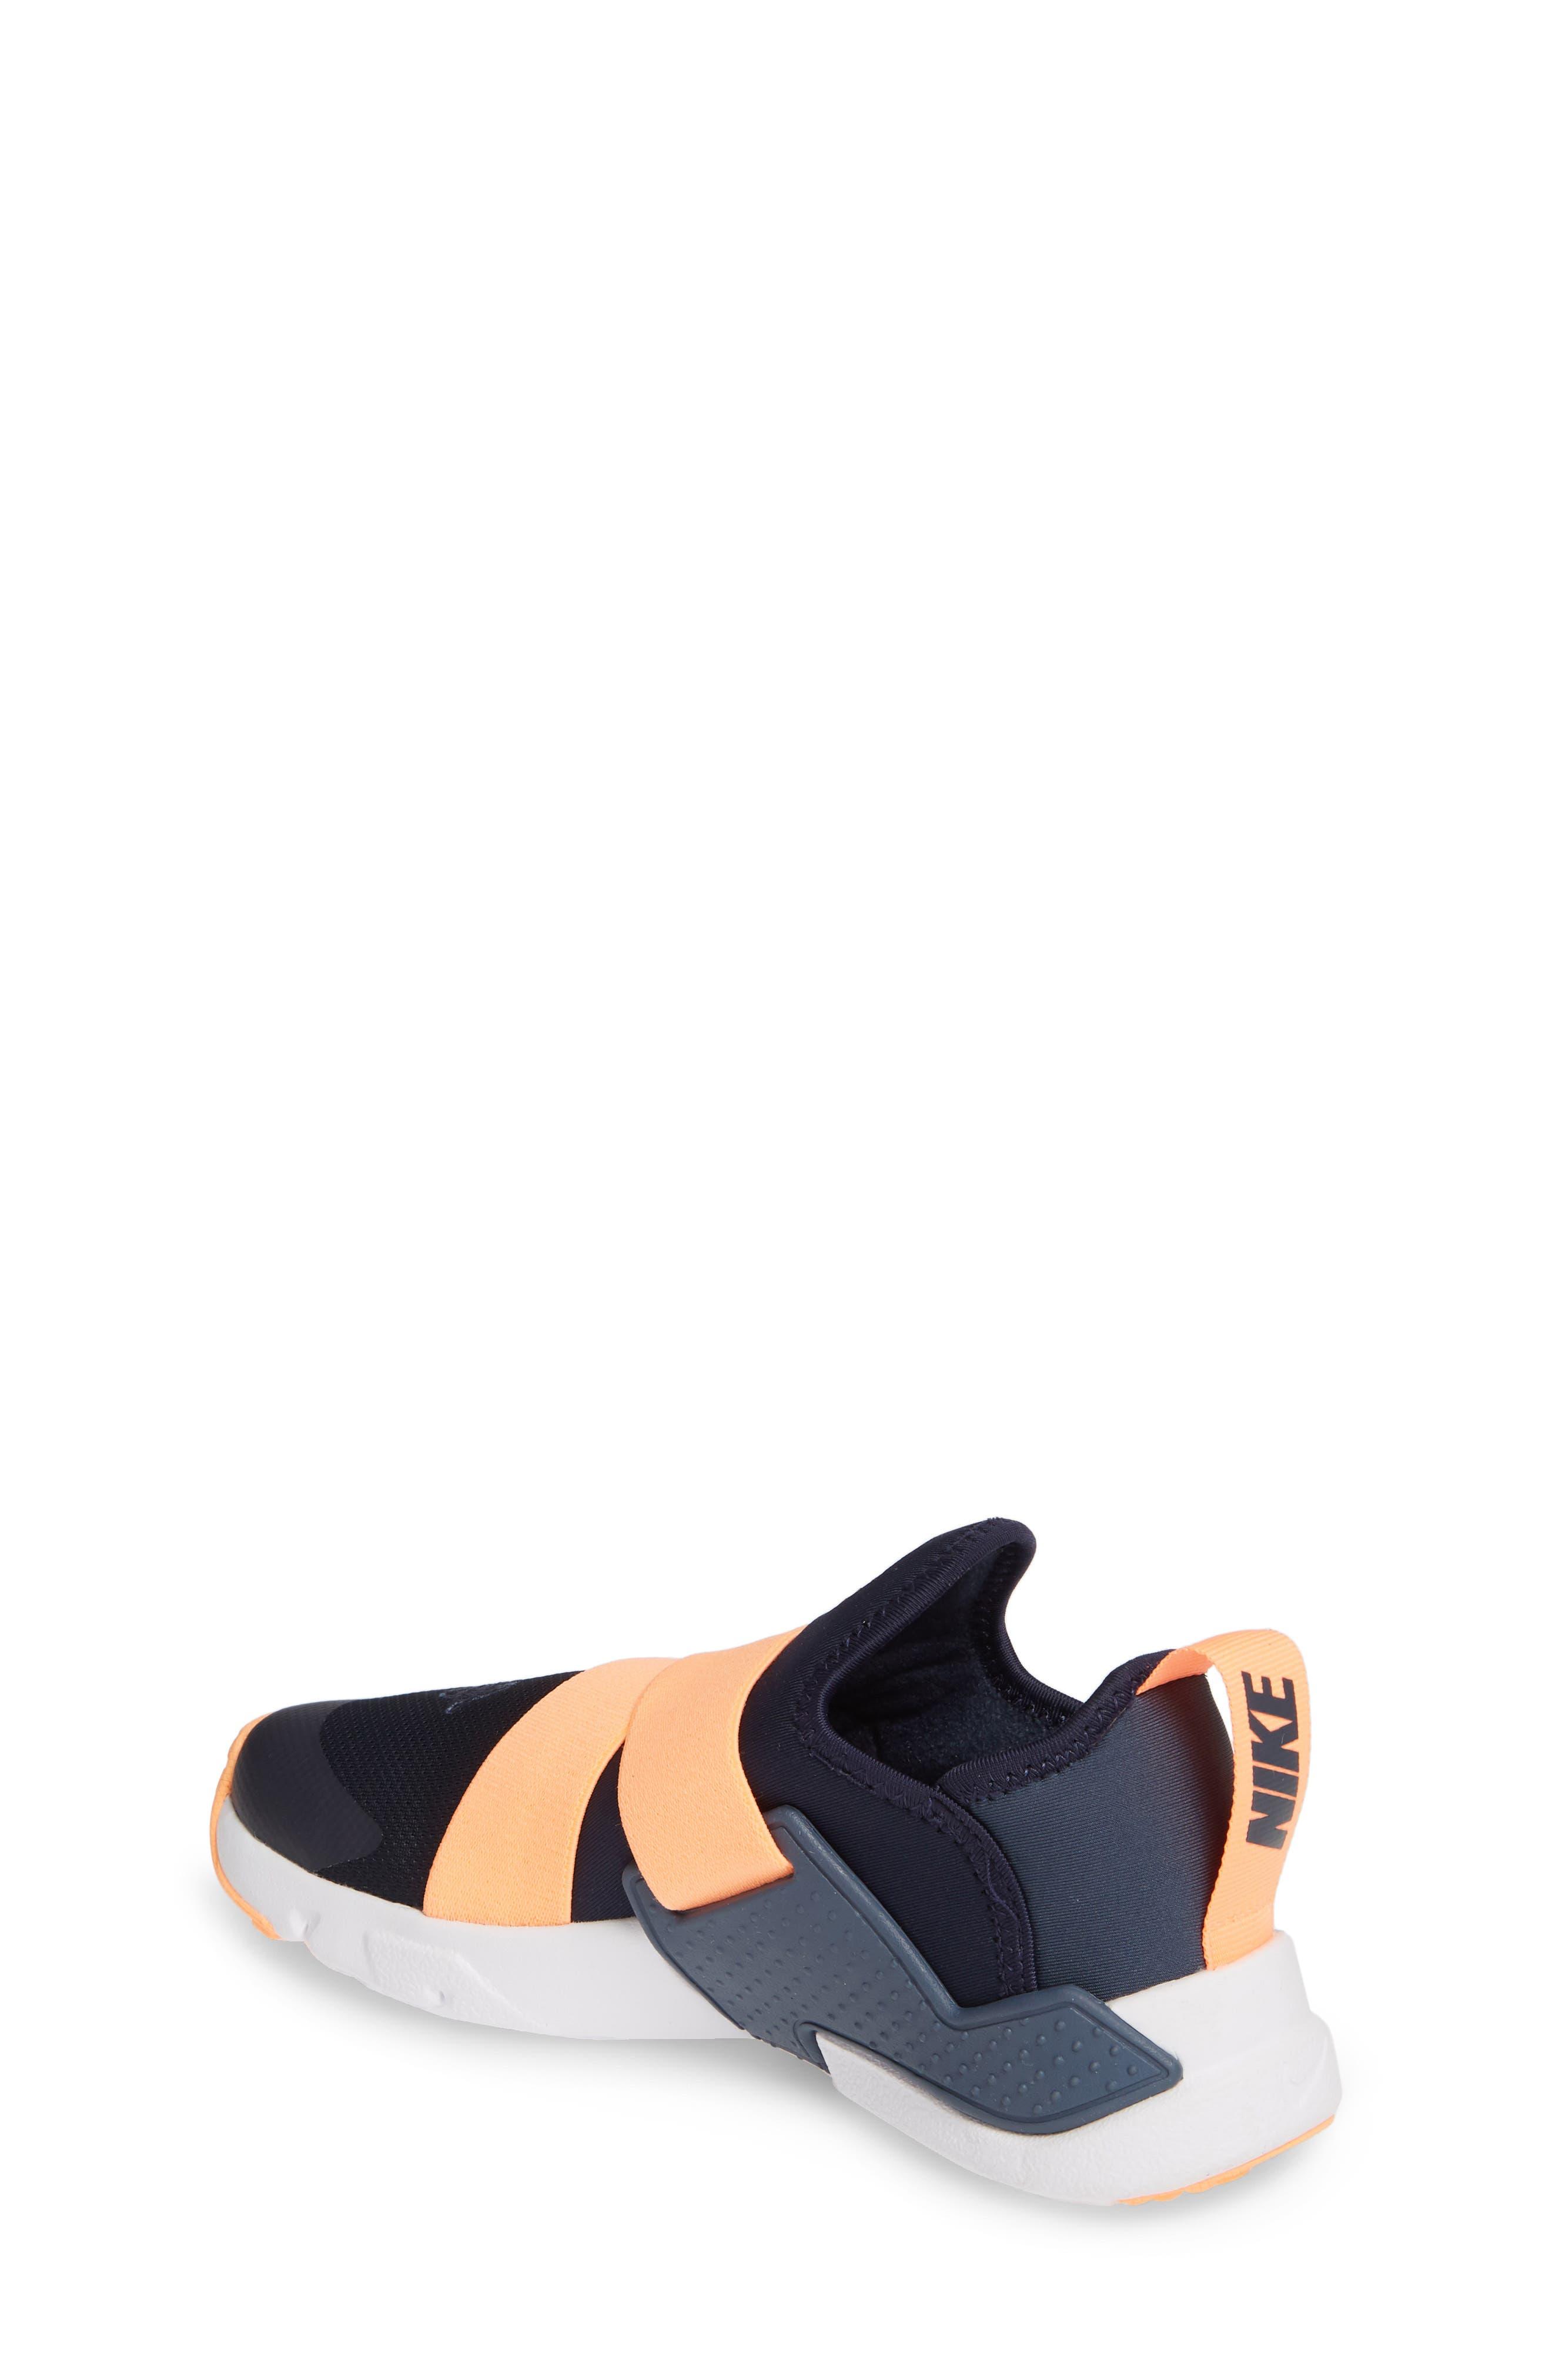 NIKE, Huarache Extreme Sneaker, Alternate thumbnail 2, color, OBSIDIAN/ POLARIZED BLUE-BLUE